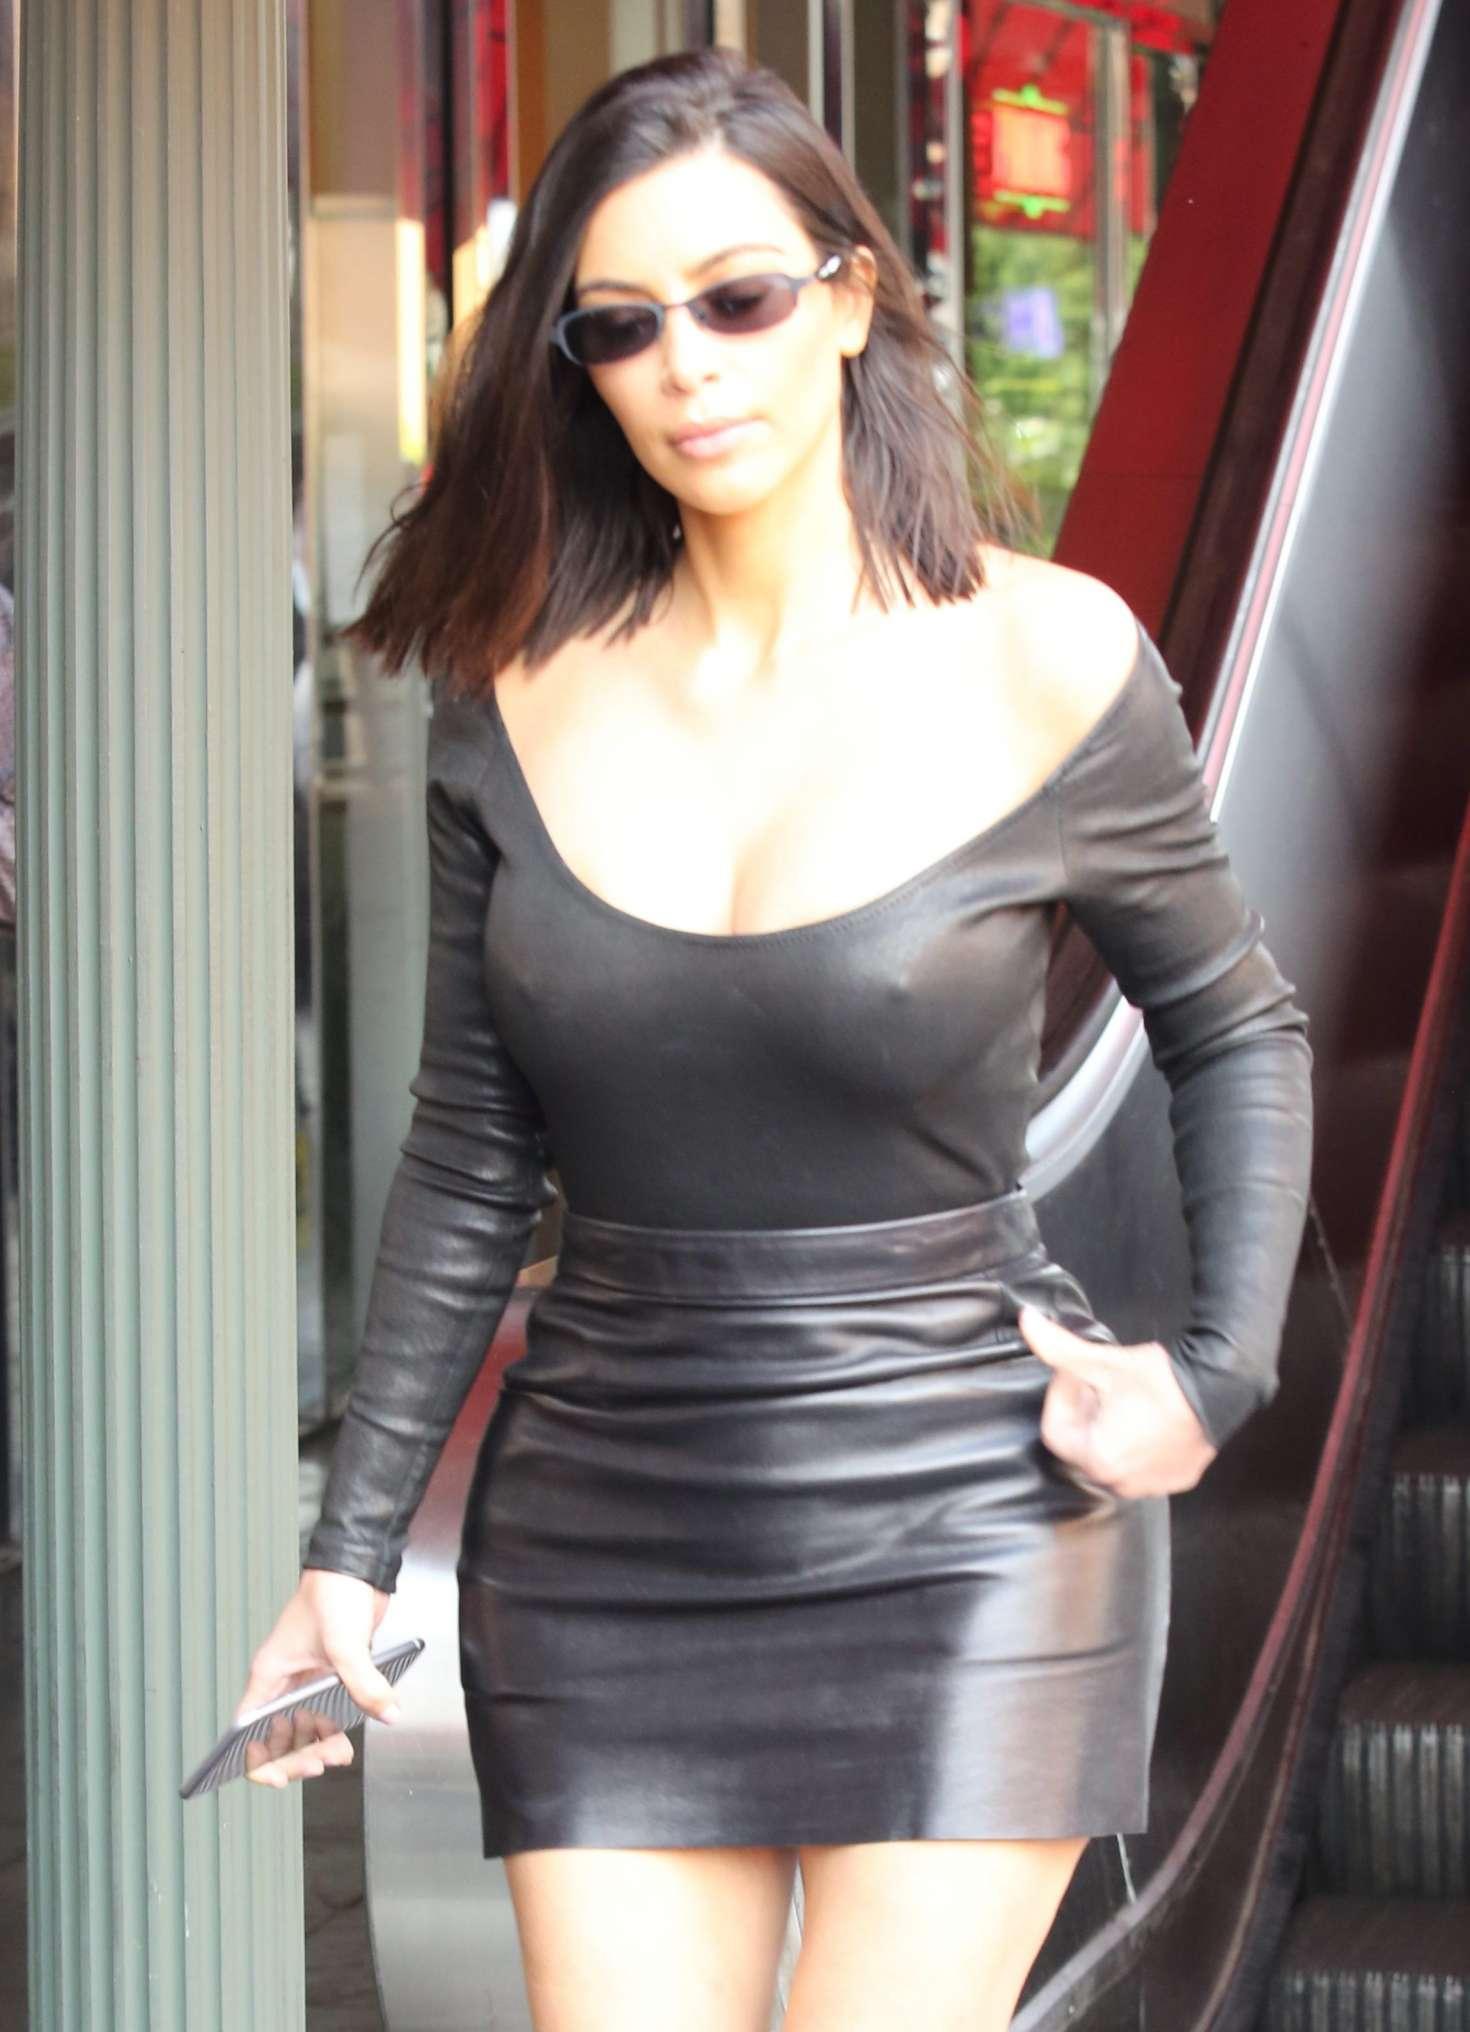 kardashian bikini striped Kim in